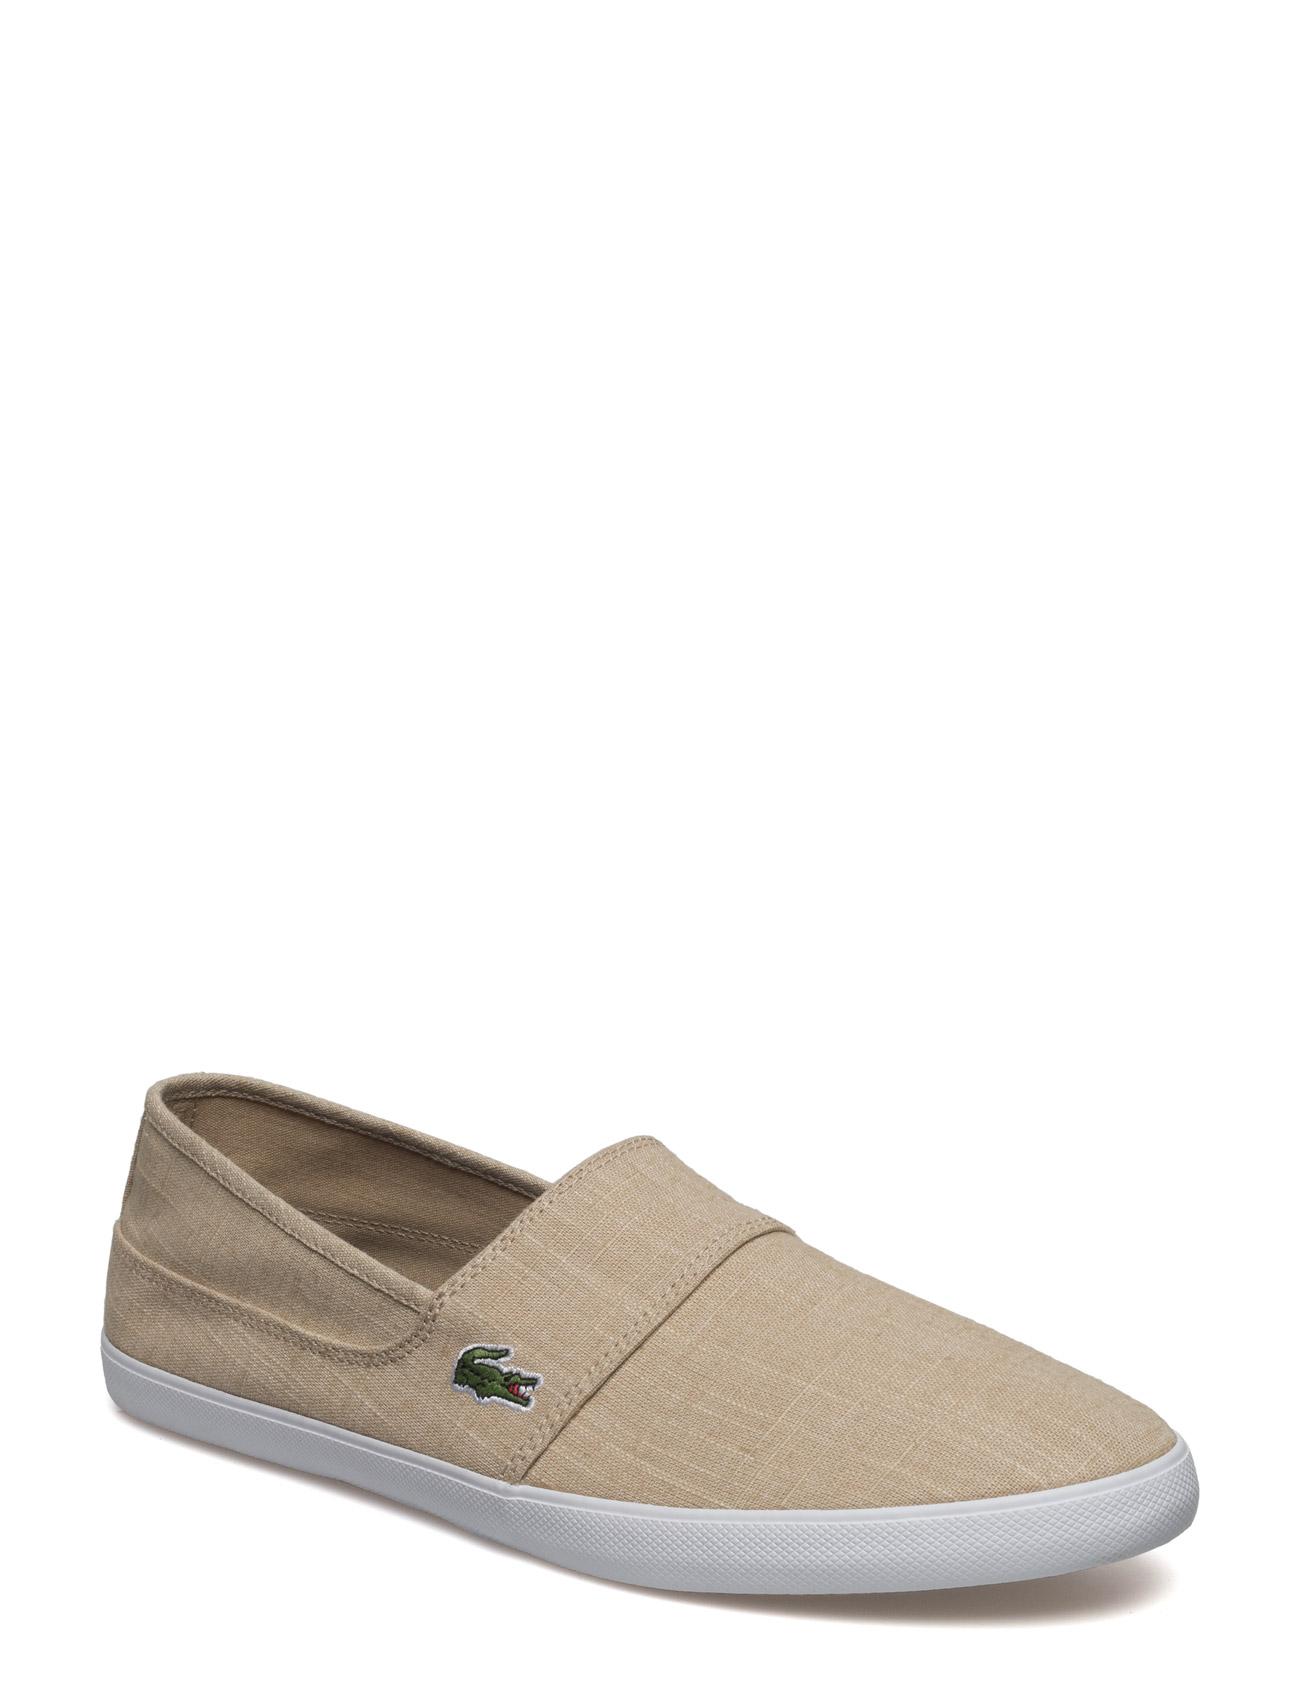 lacoste shoes Marice 217 1 på boozt.com dk